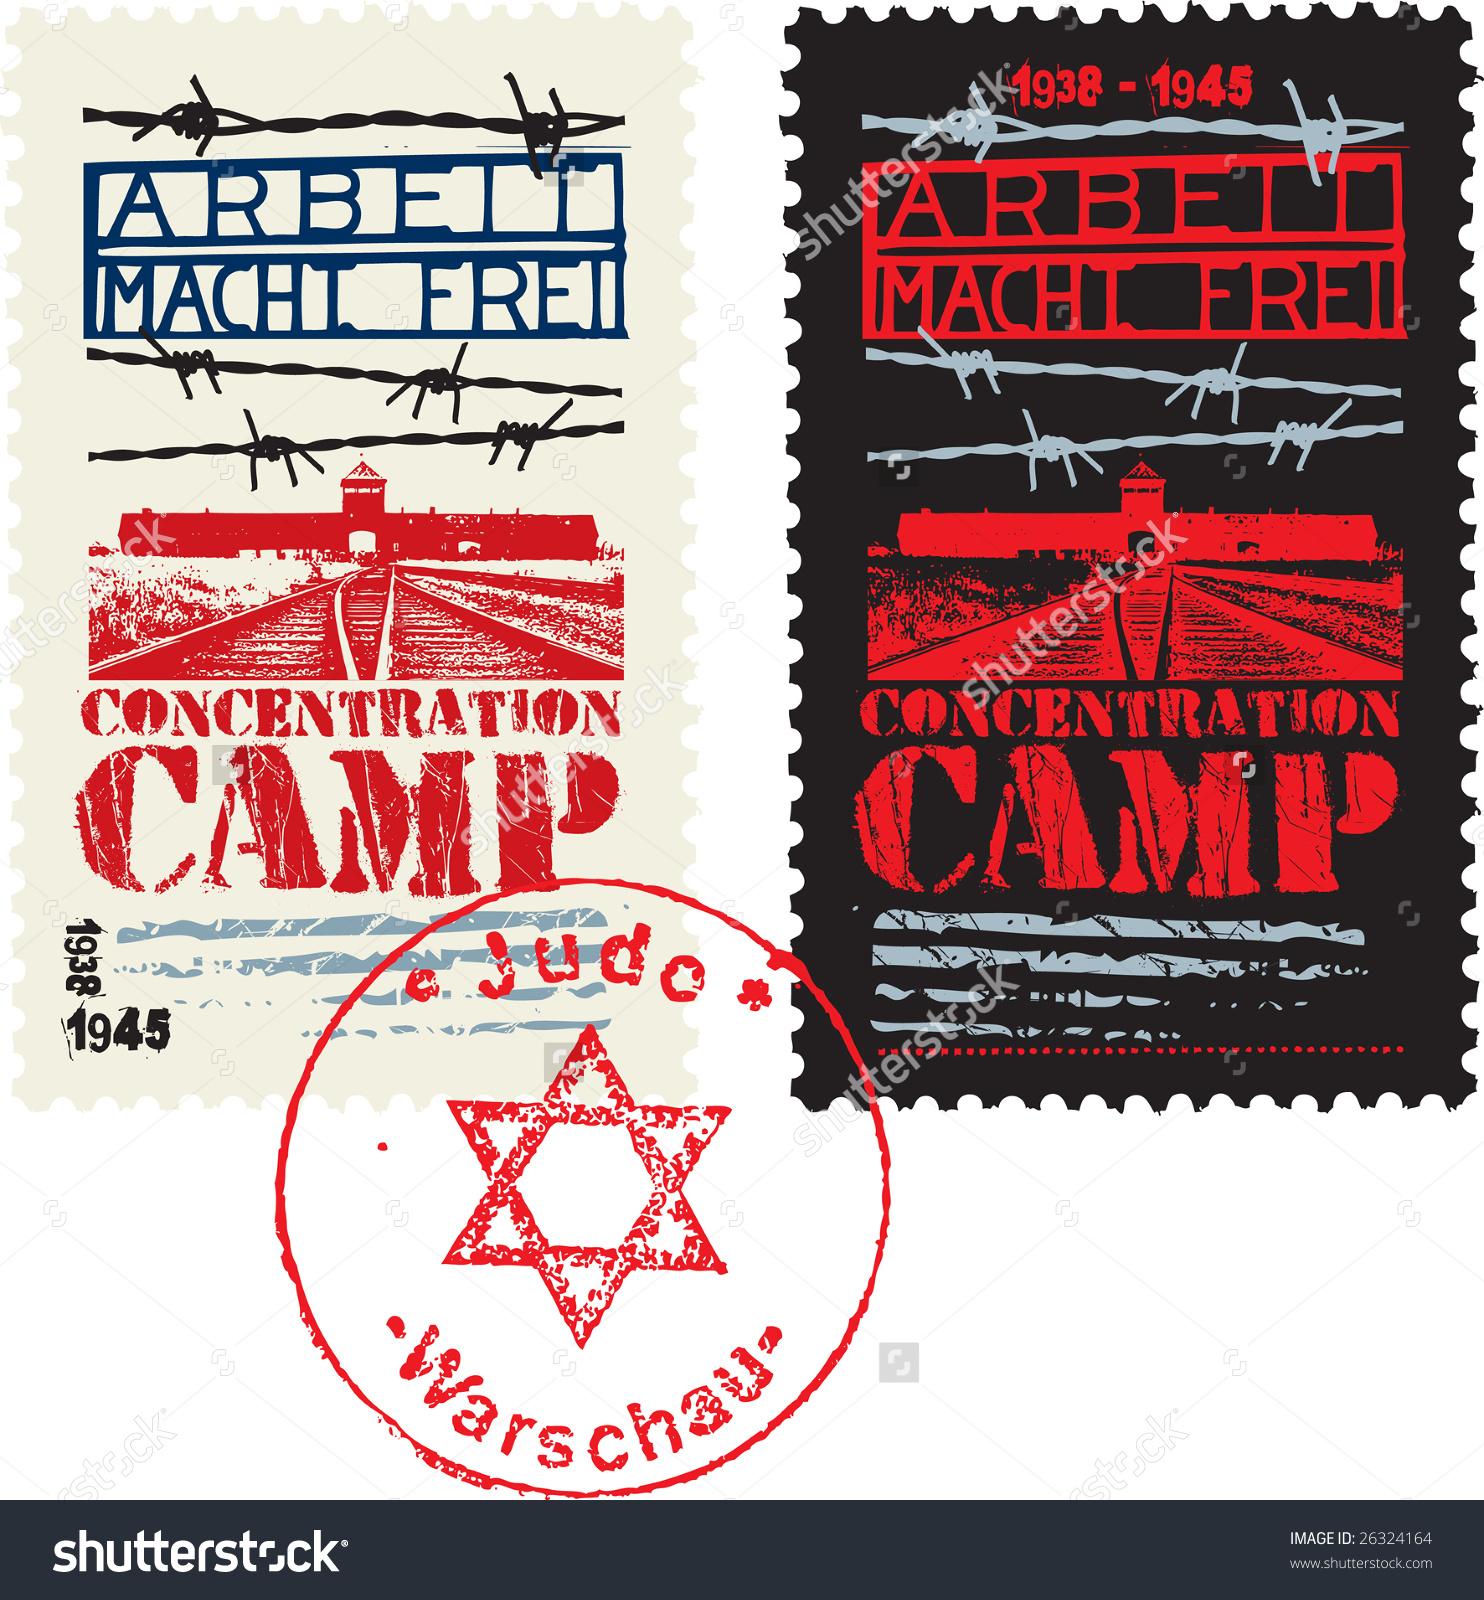 Concentration Camp Design Stock Vector Illustration 26324164.